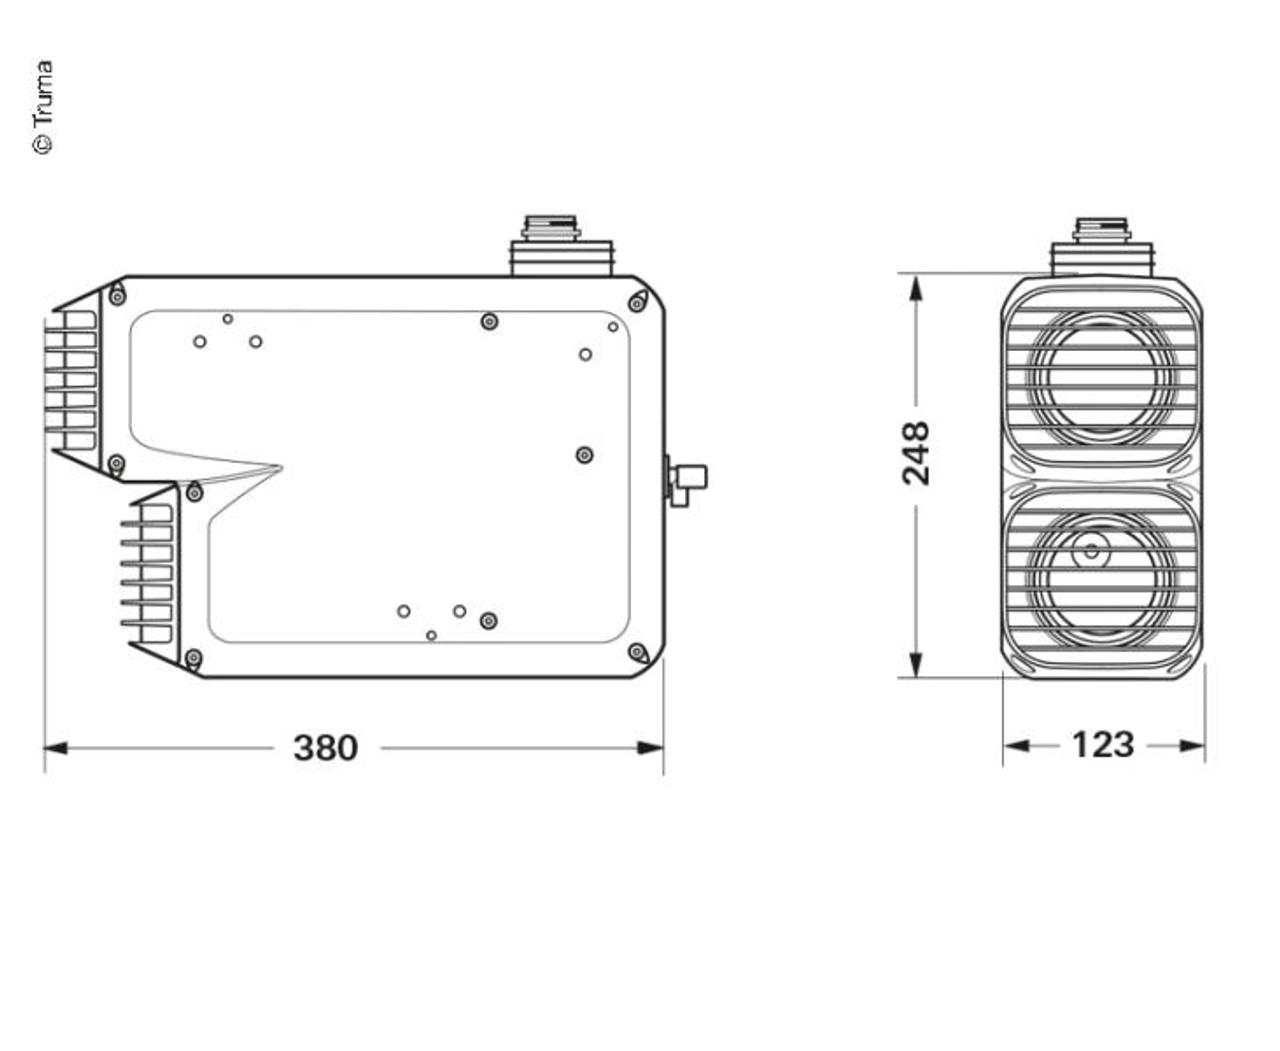 Diagram illustrating dimensions of the Varioheat caravan space heater by Truma.